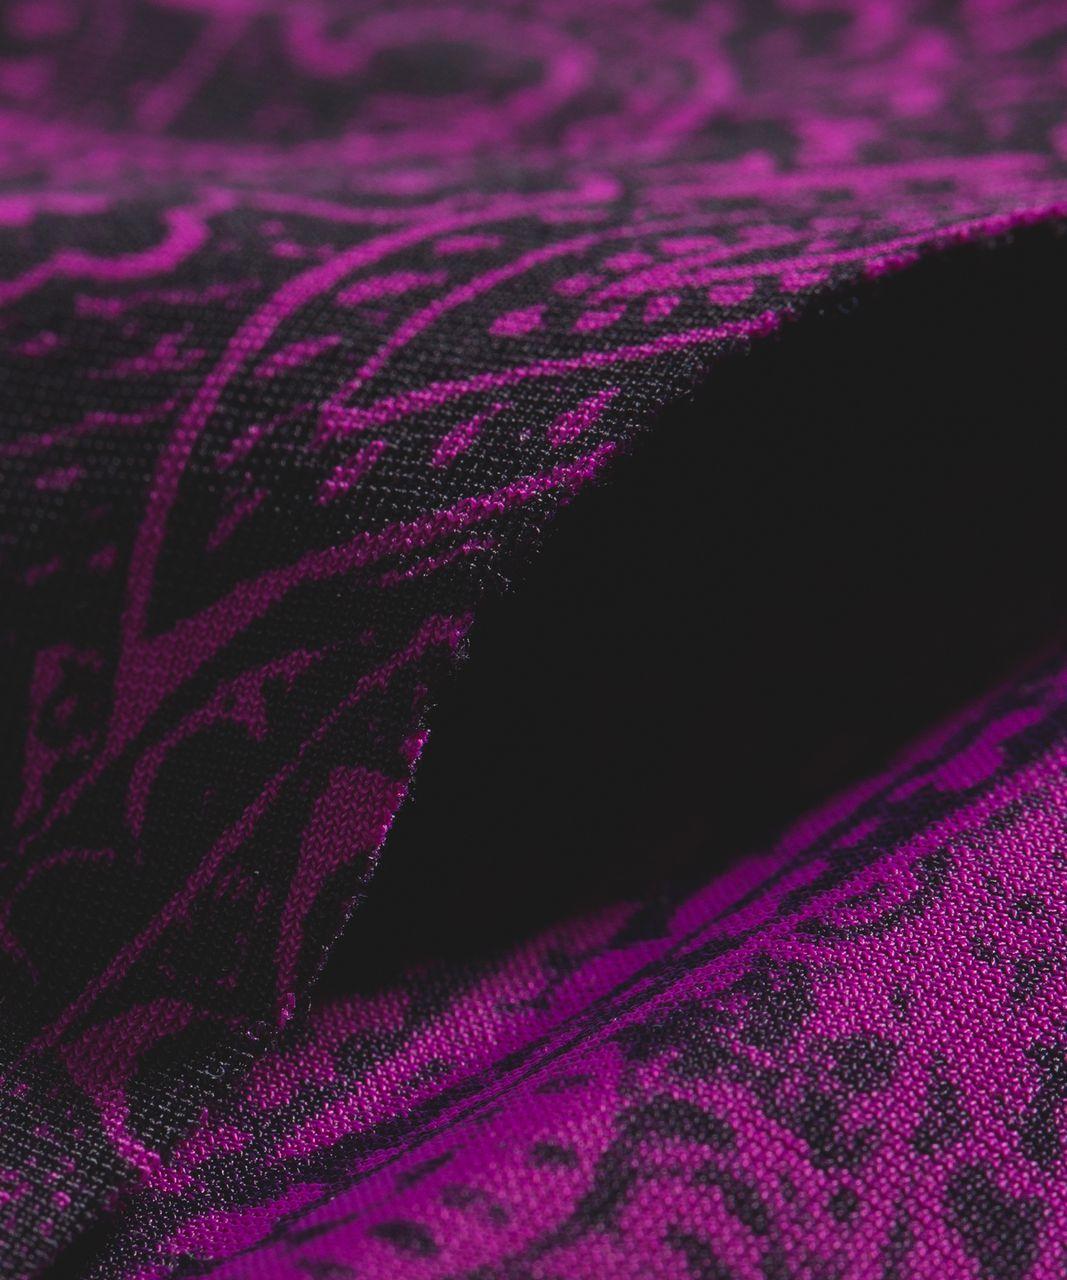 Lululemon Namastay Put Hipster - Mini Antique Paisley Deep Fuschia Black